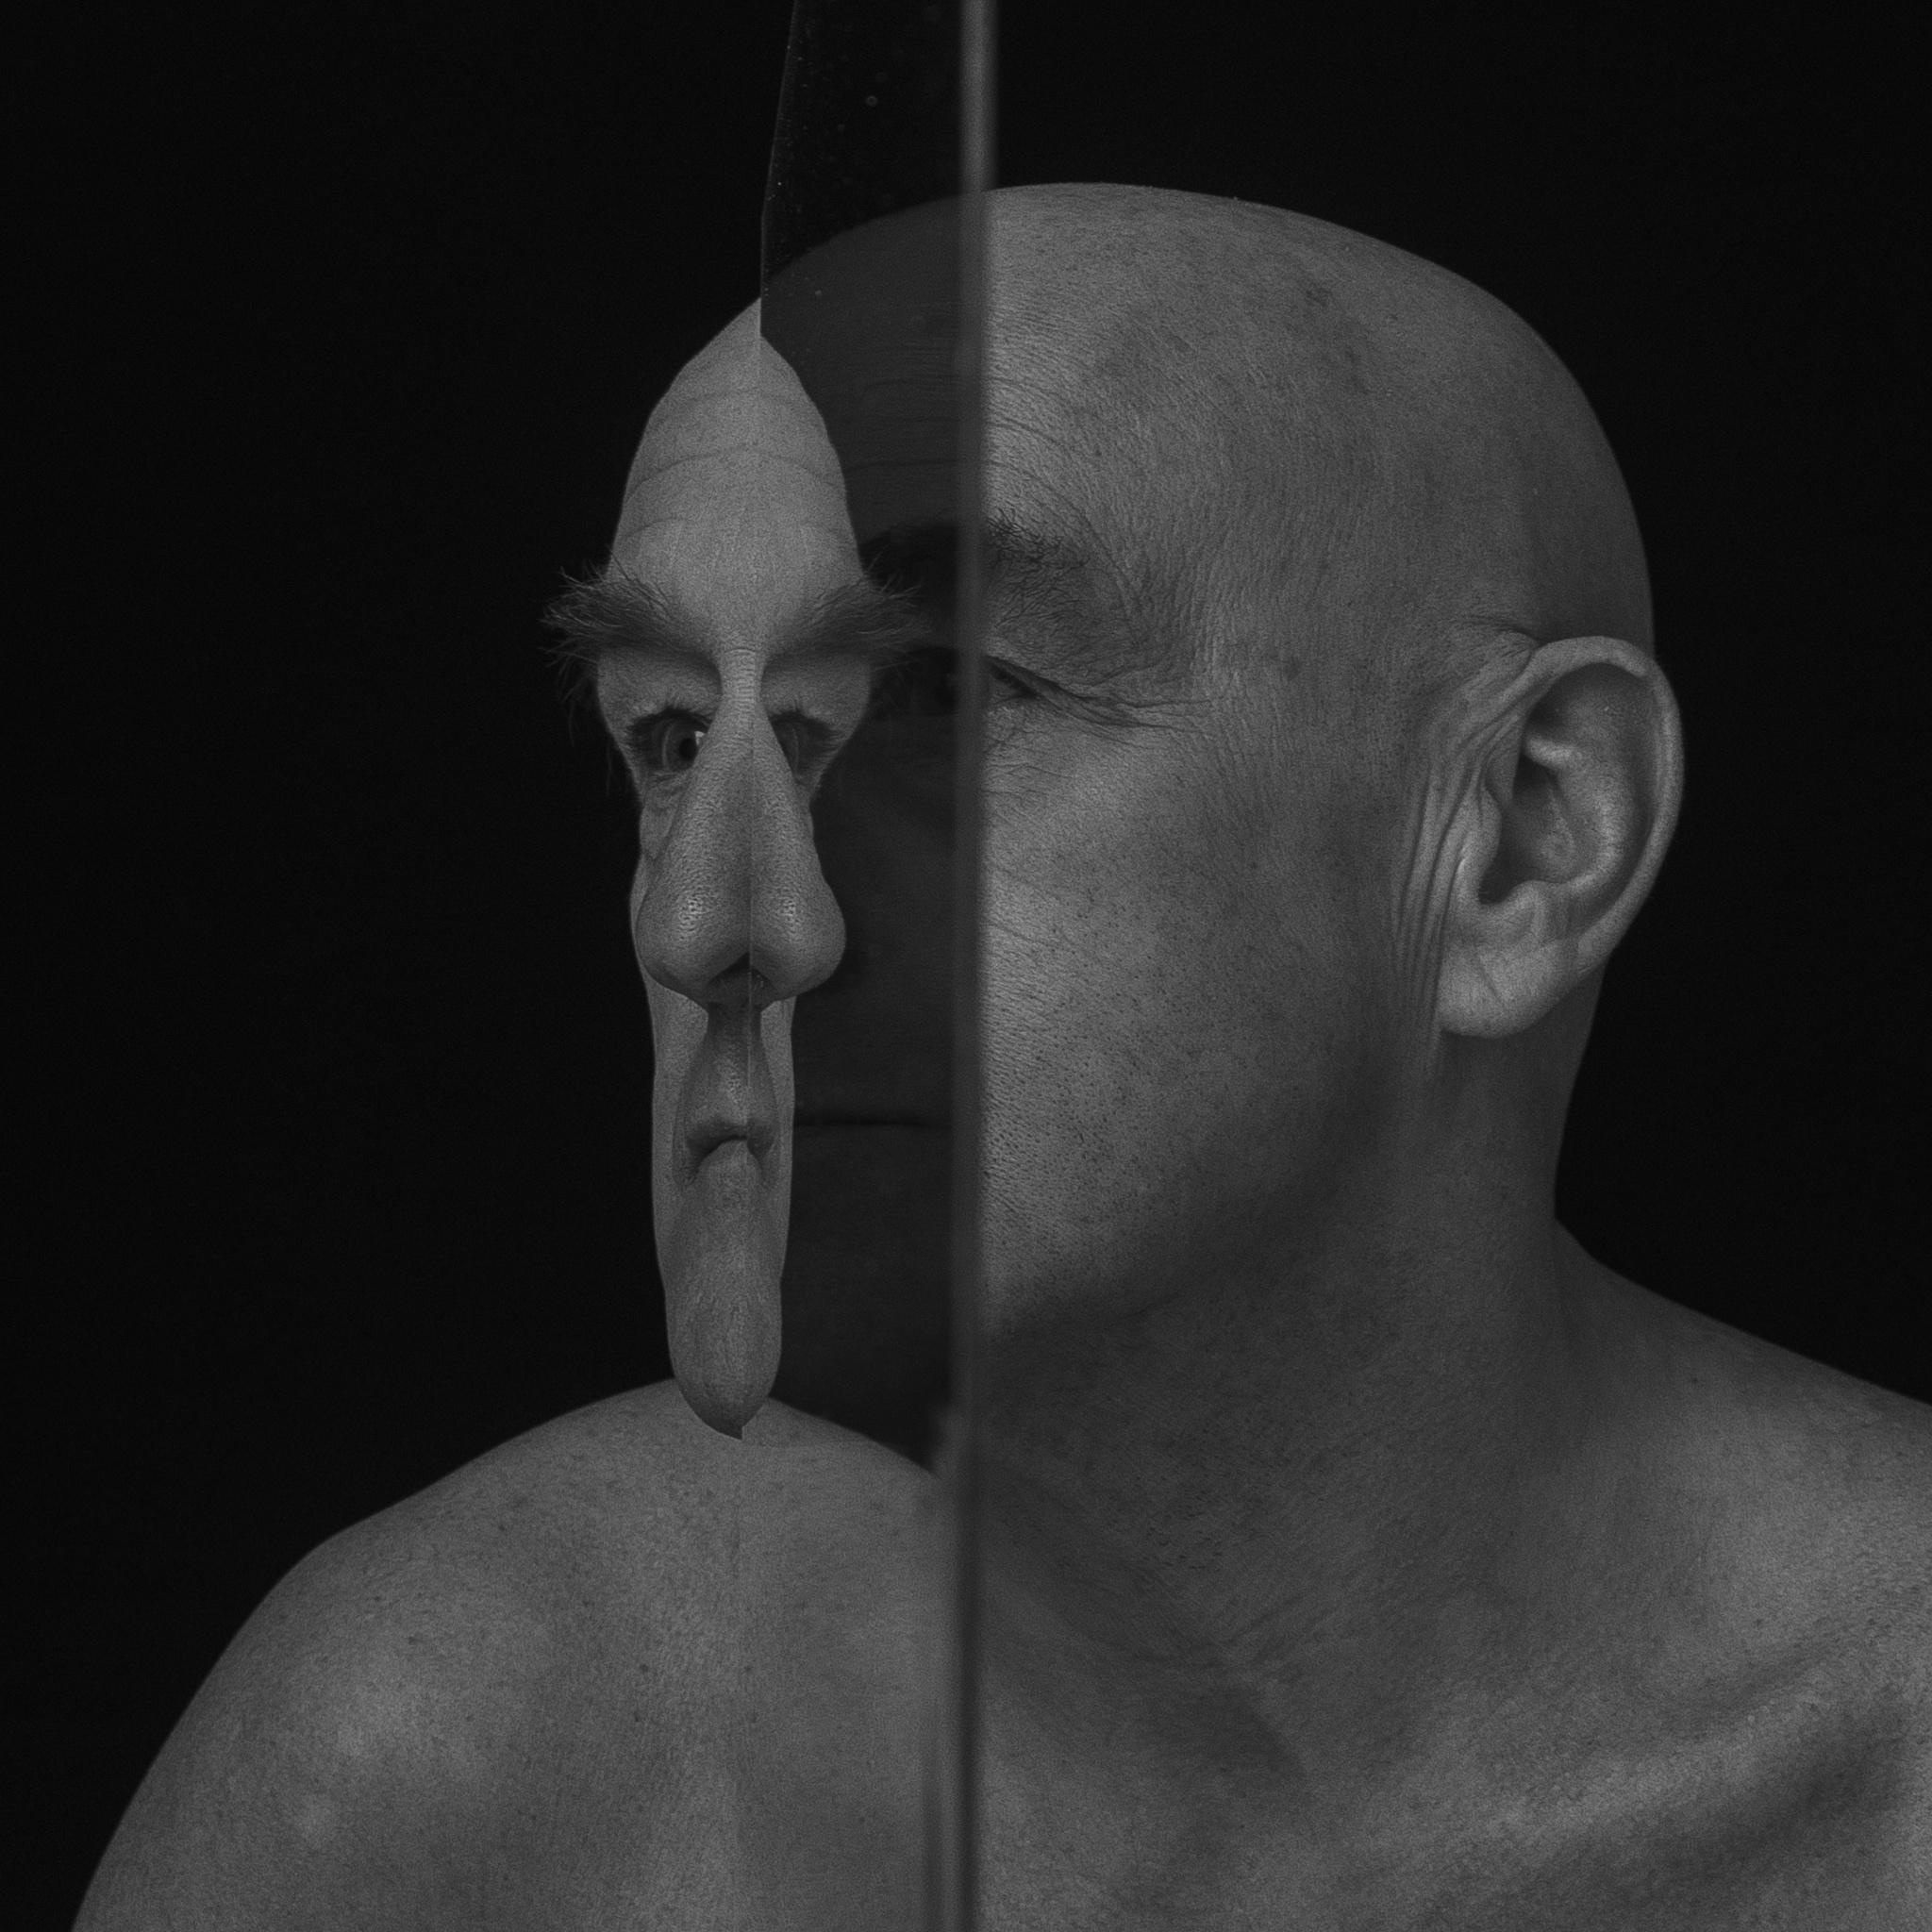 Reflection by Jan Bosch